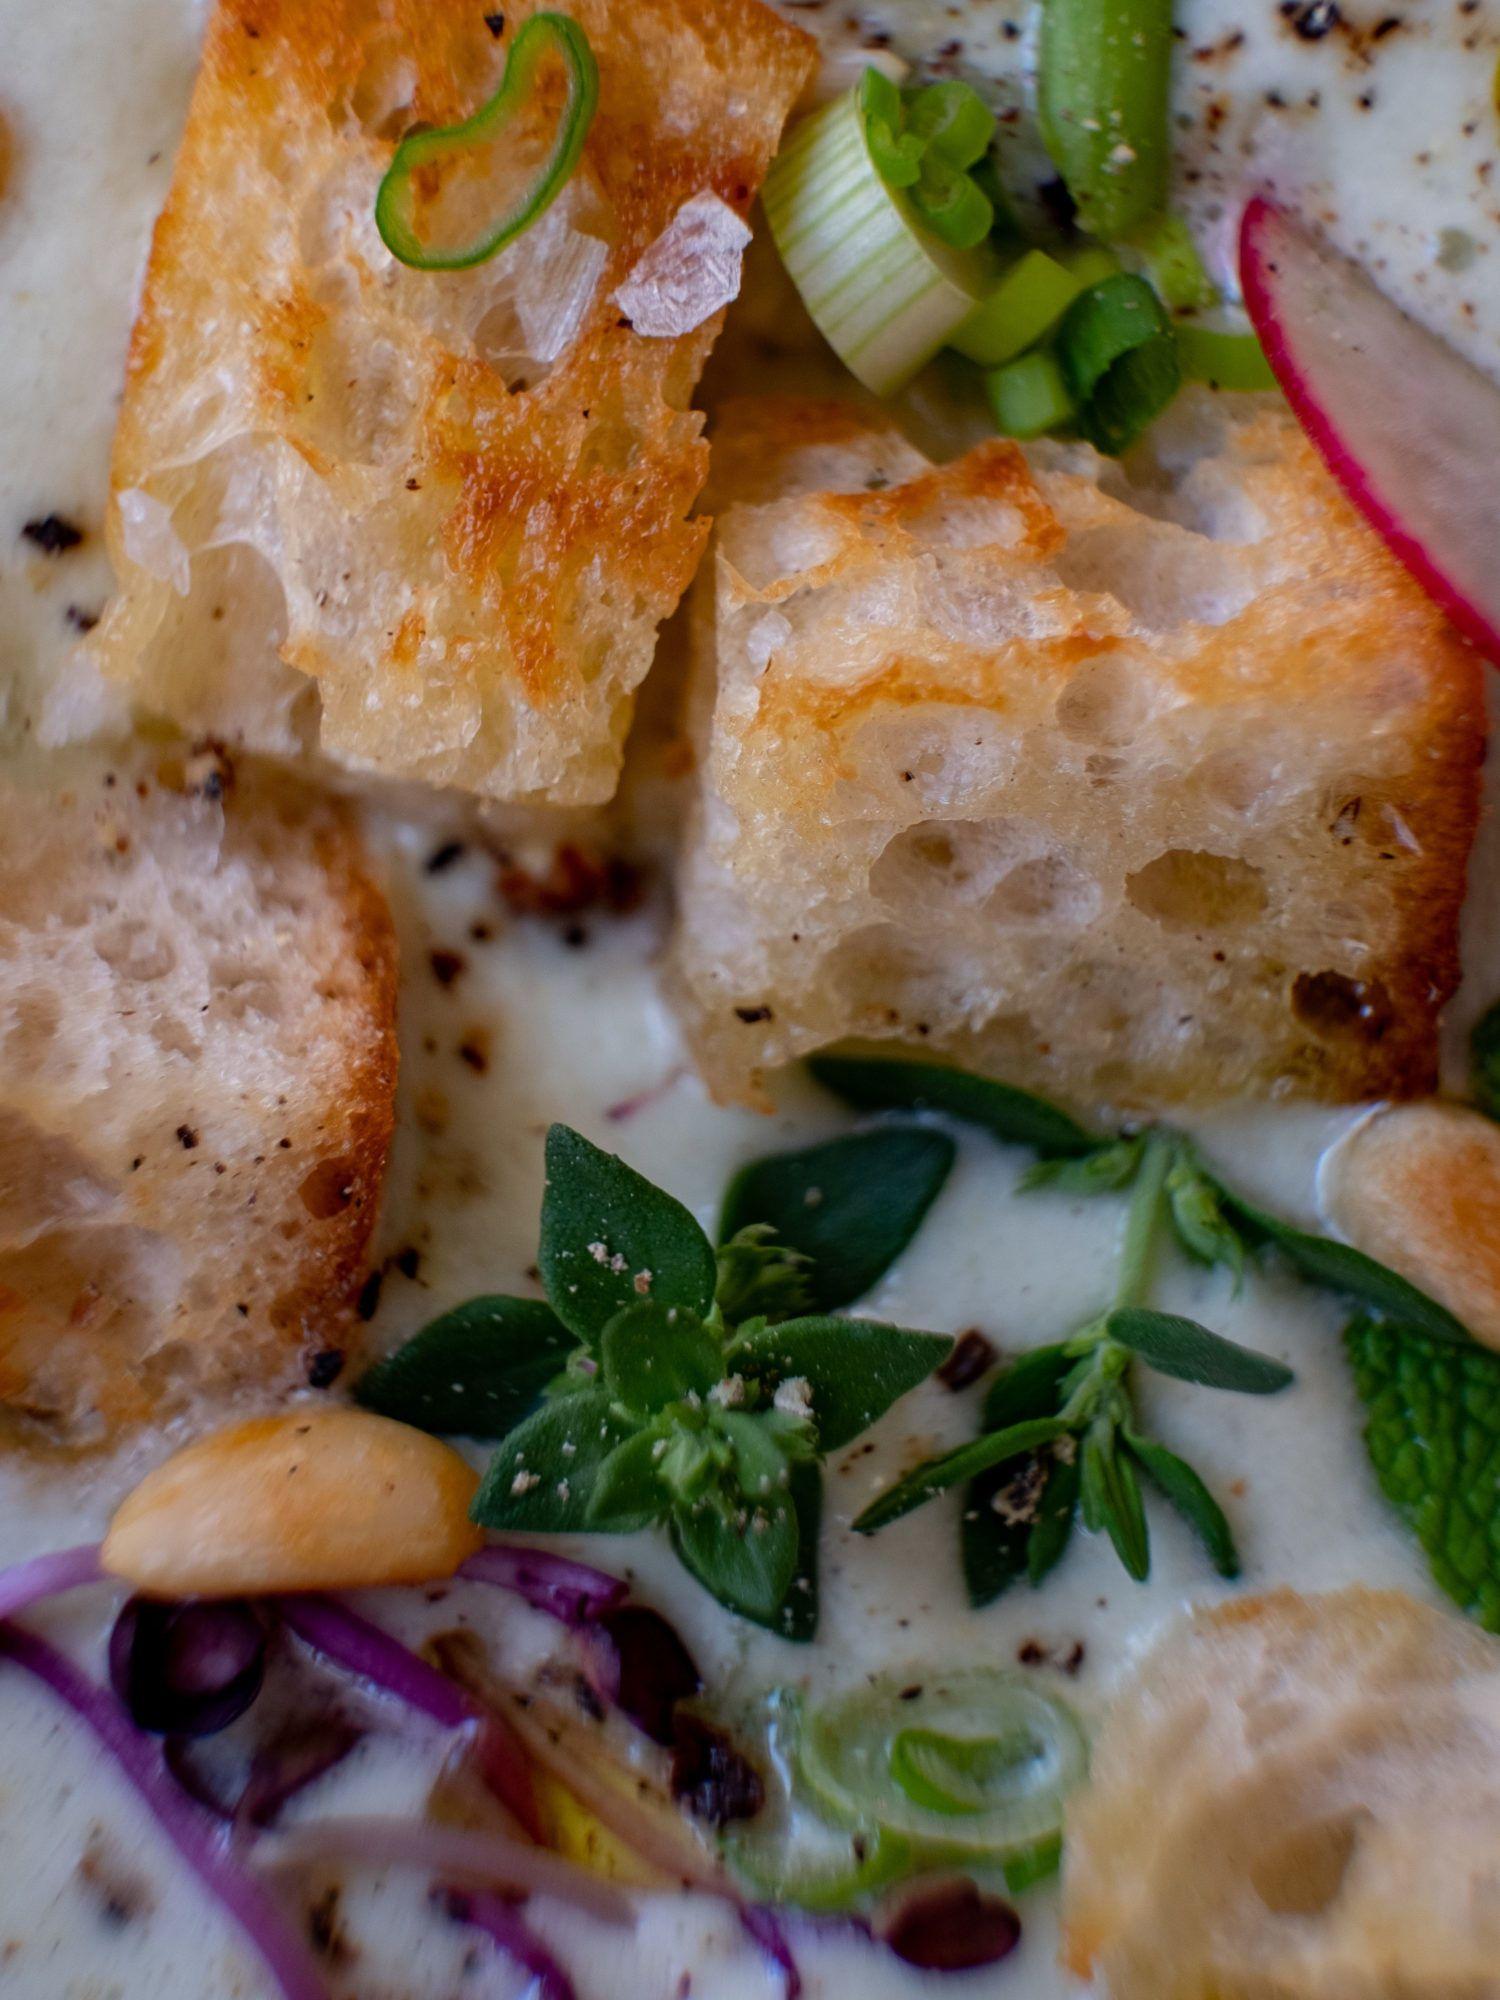 Foodblog, About Fuel, Rezept Gurken-Mandel-Gazpacho mit Croutons, Thymian, Minze